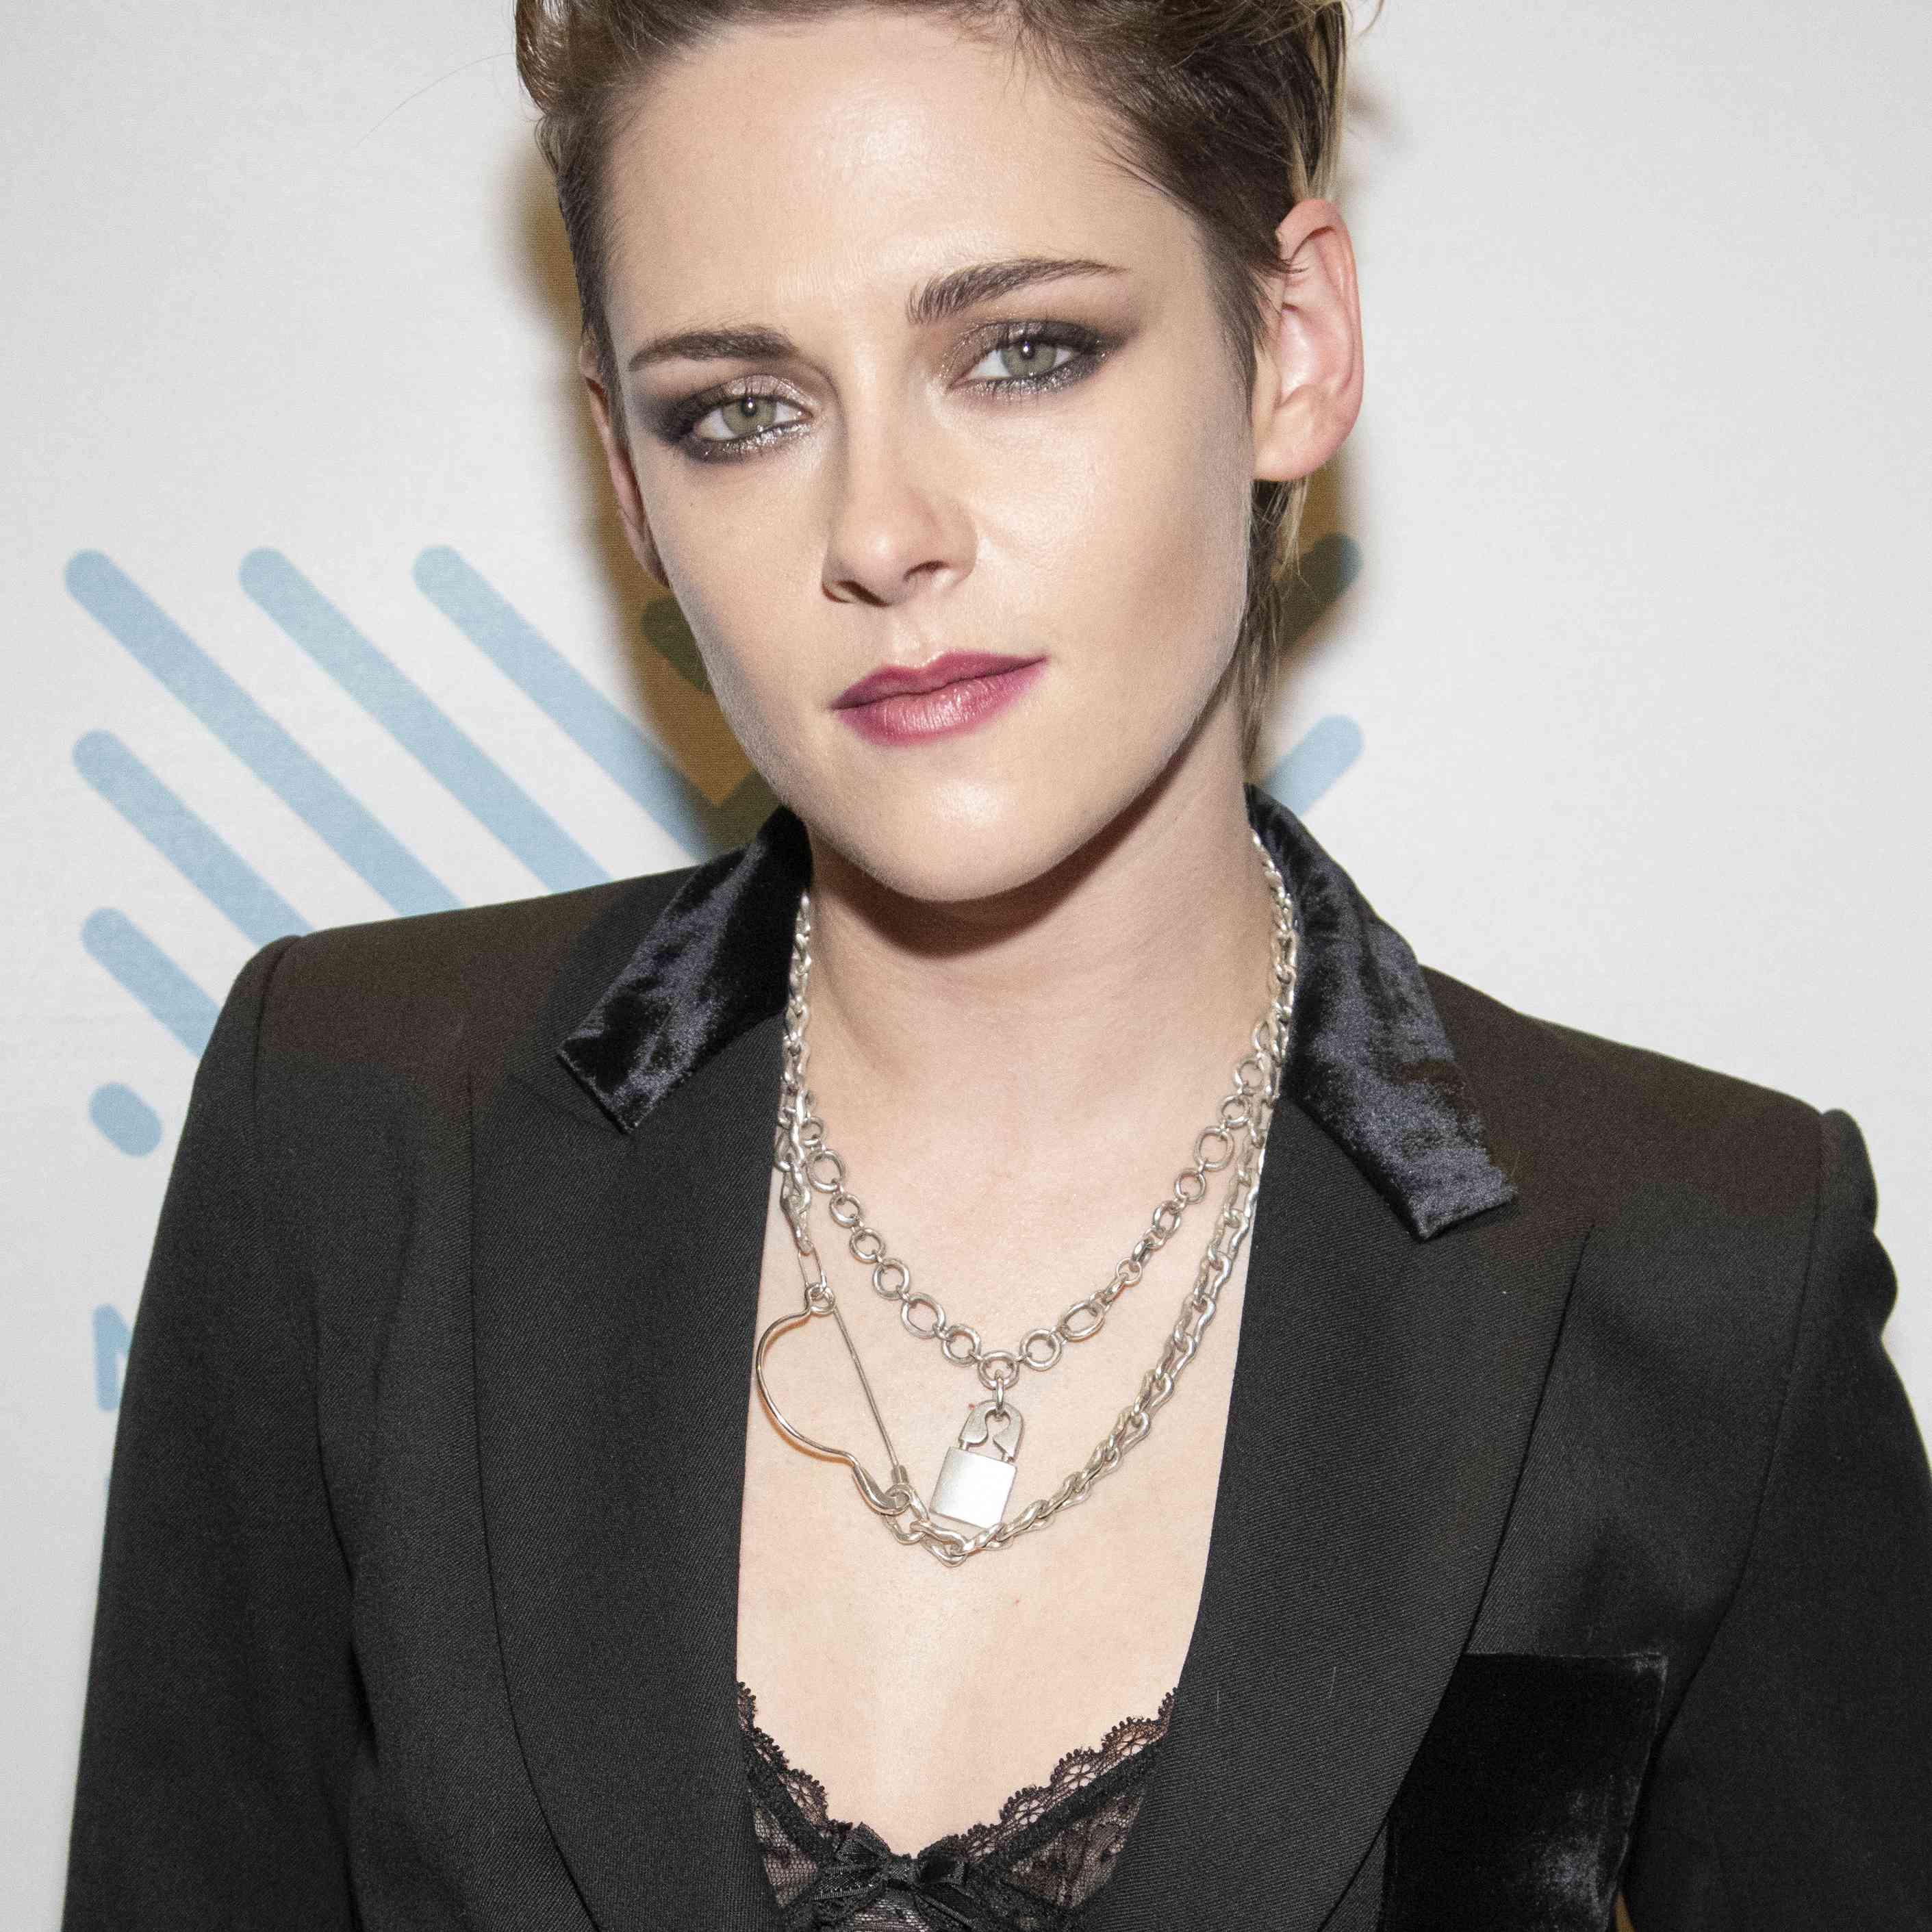 Kristen Stewart posing at the 42nd Mill Valley Film Festival